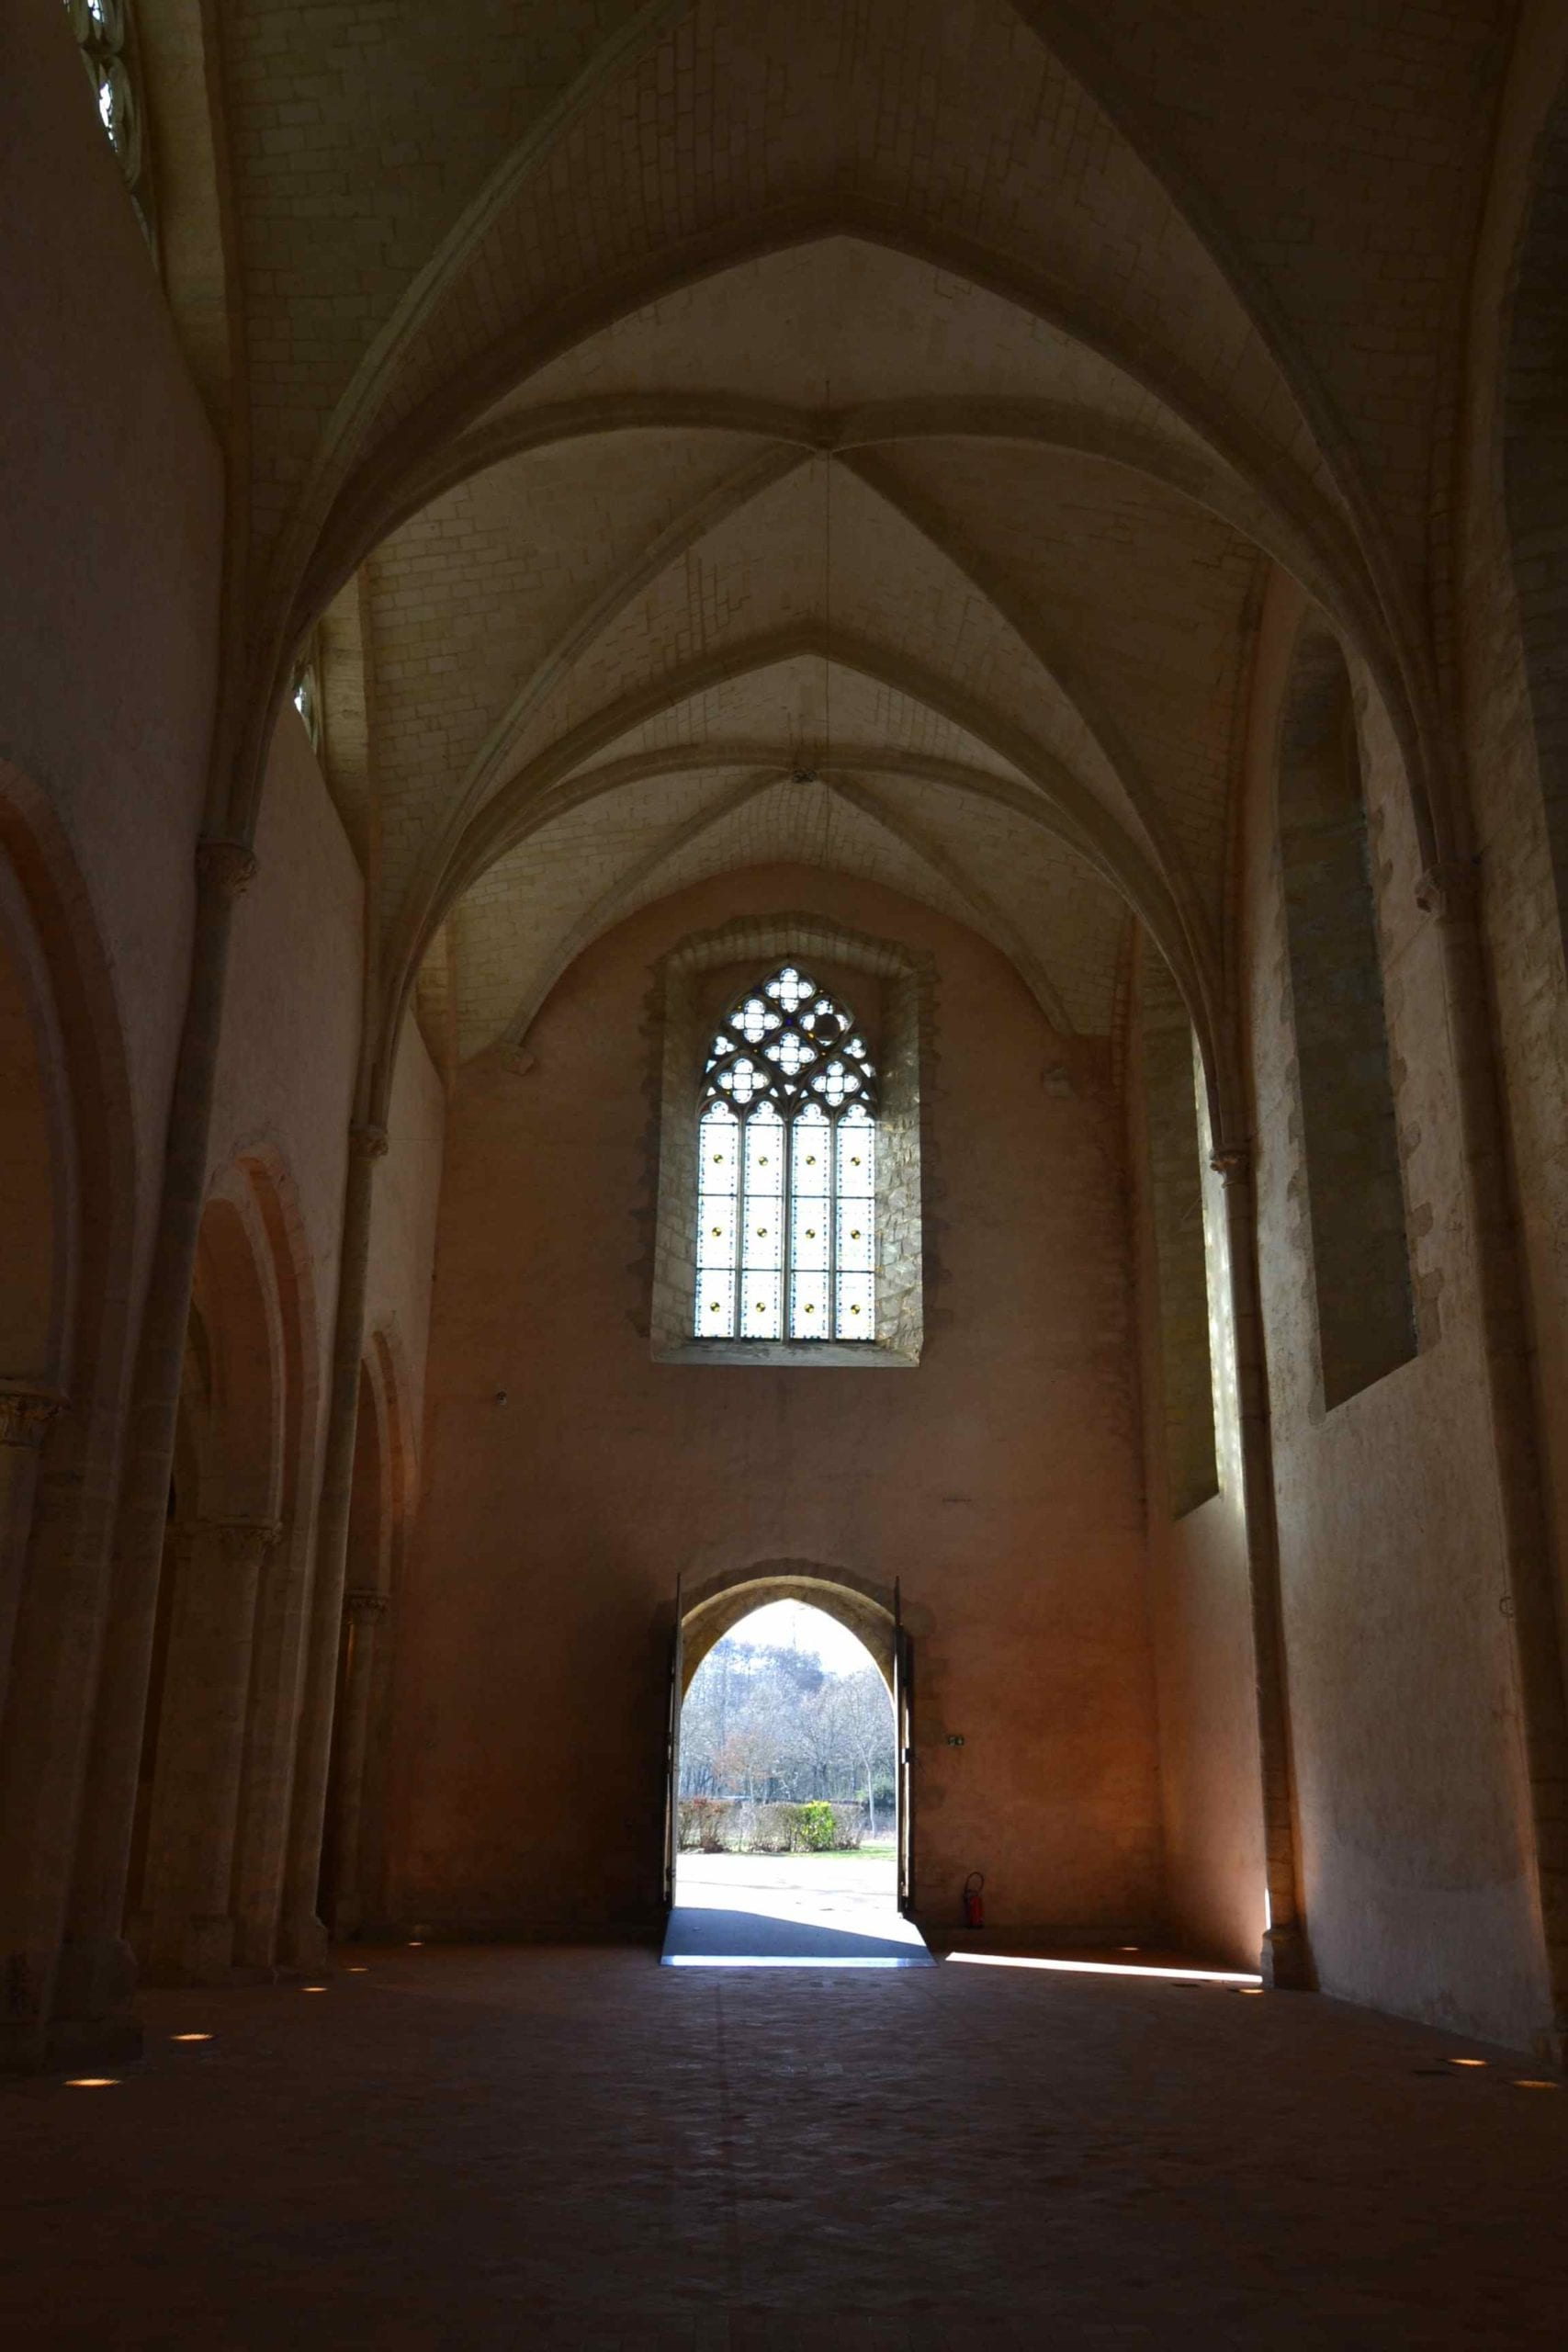 Visiter l'abbaye de l'epau